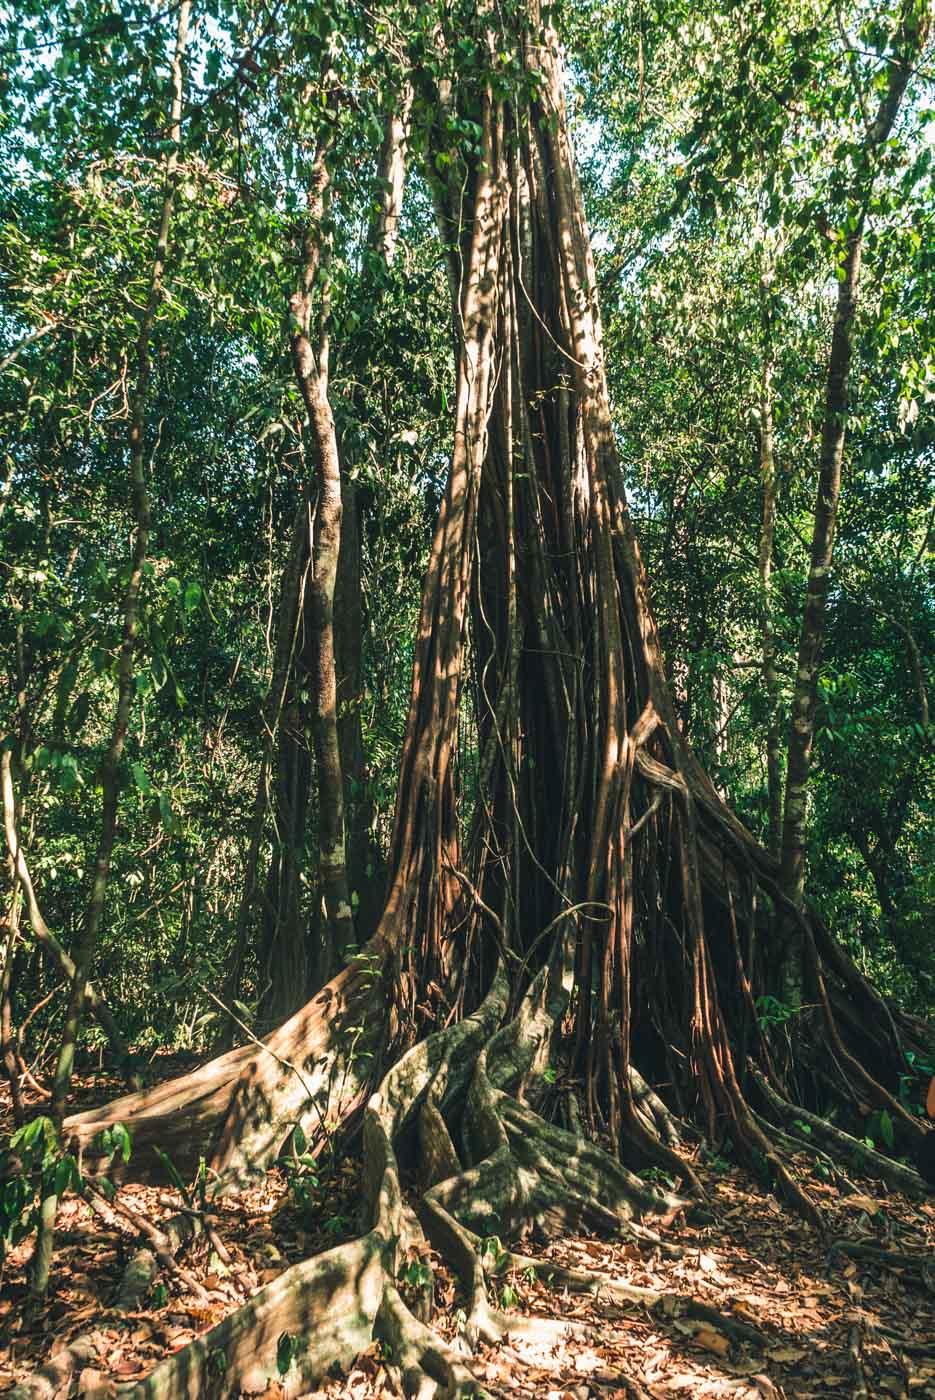 Guide to Volunteering in Costa Rica